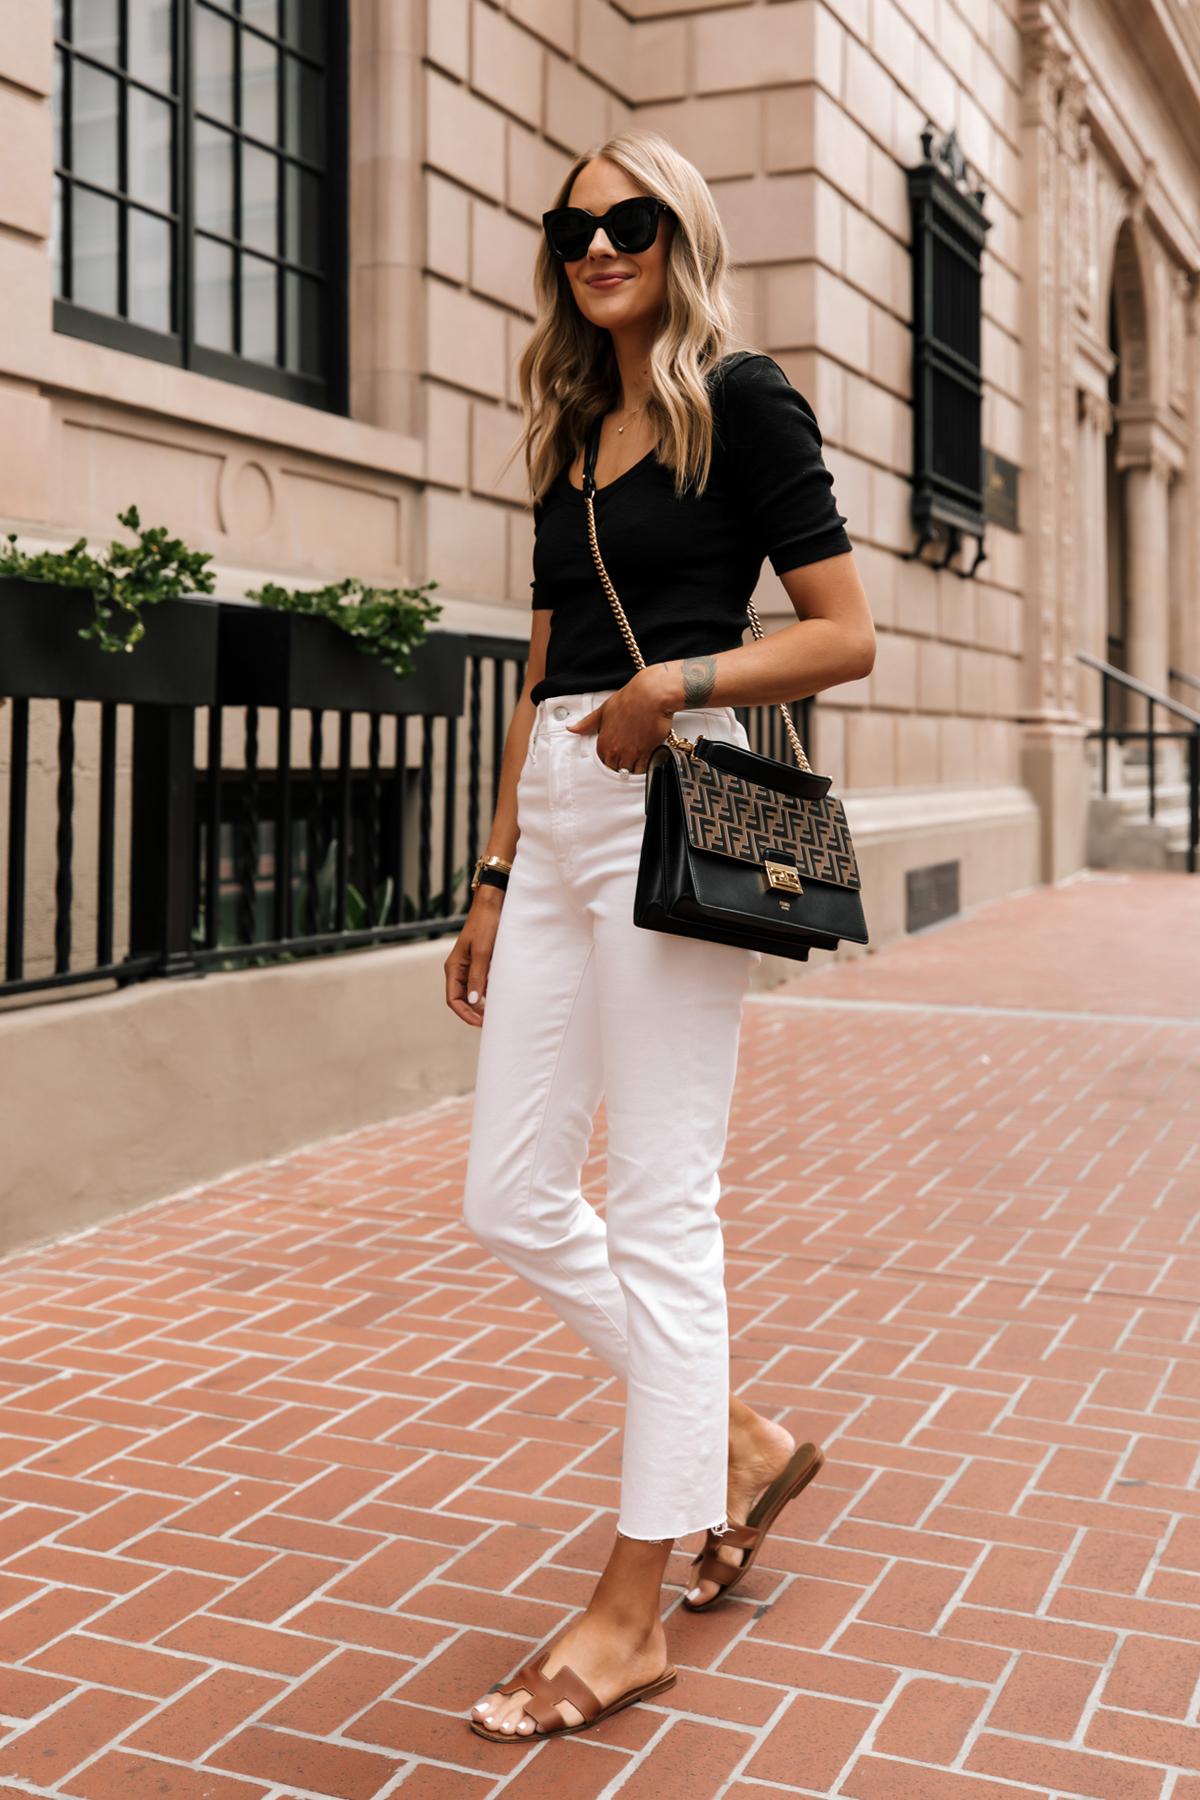 Fashion Jackson Wearing Black Scoop Neck Top White Jeans Fendi Ken U Medium Shoulder Bag Hermes Oran Tan Sandals white jeans summer outfit